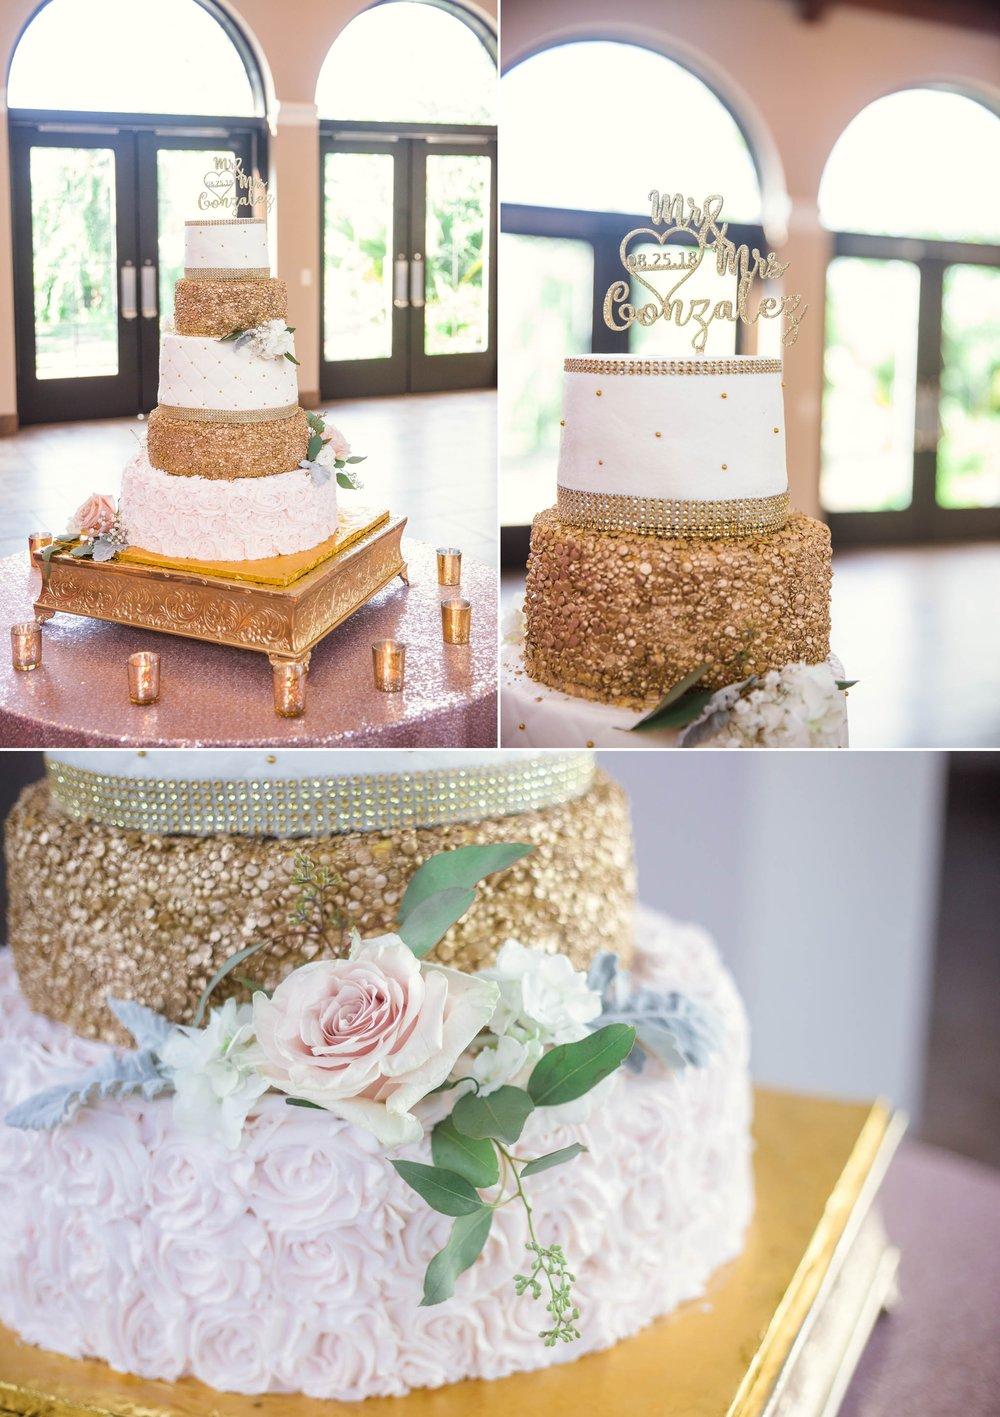 The Wedding Cake - Yansi + Eddie - Wedding at Cape Fear Botanical Garden - Fayetteville North Carolina Photographer